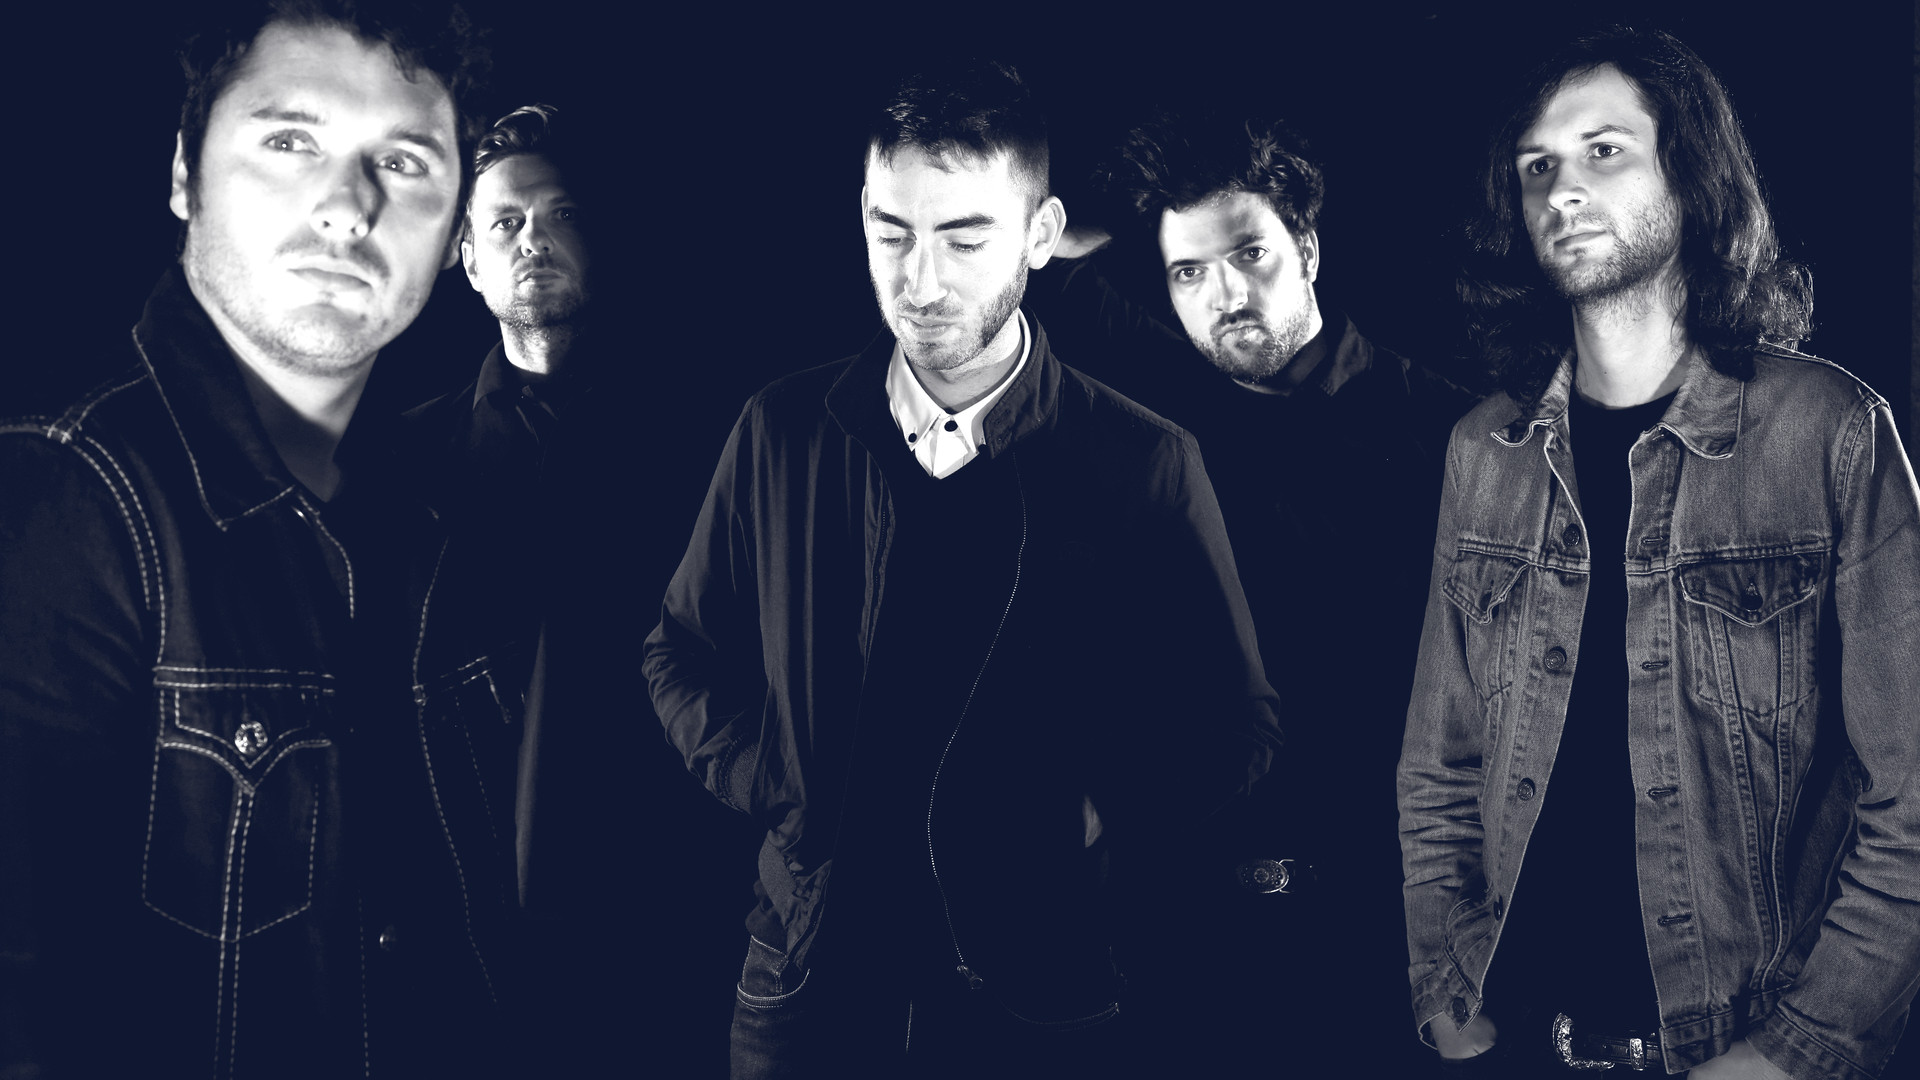 Bigger, rock music from France, Kevin Twomey, Damien Felix, Benjamin Muller, Antoine Passard, Mike Prenat